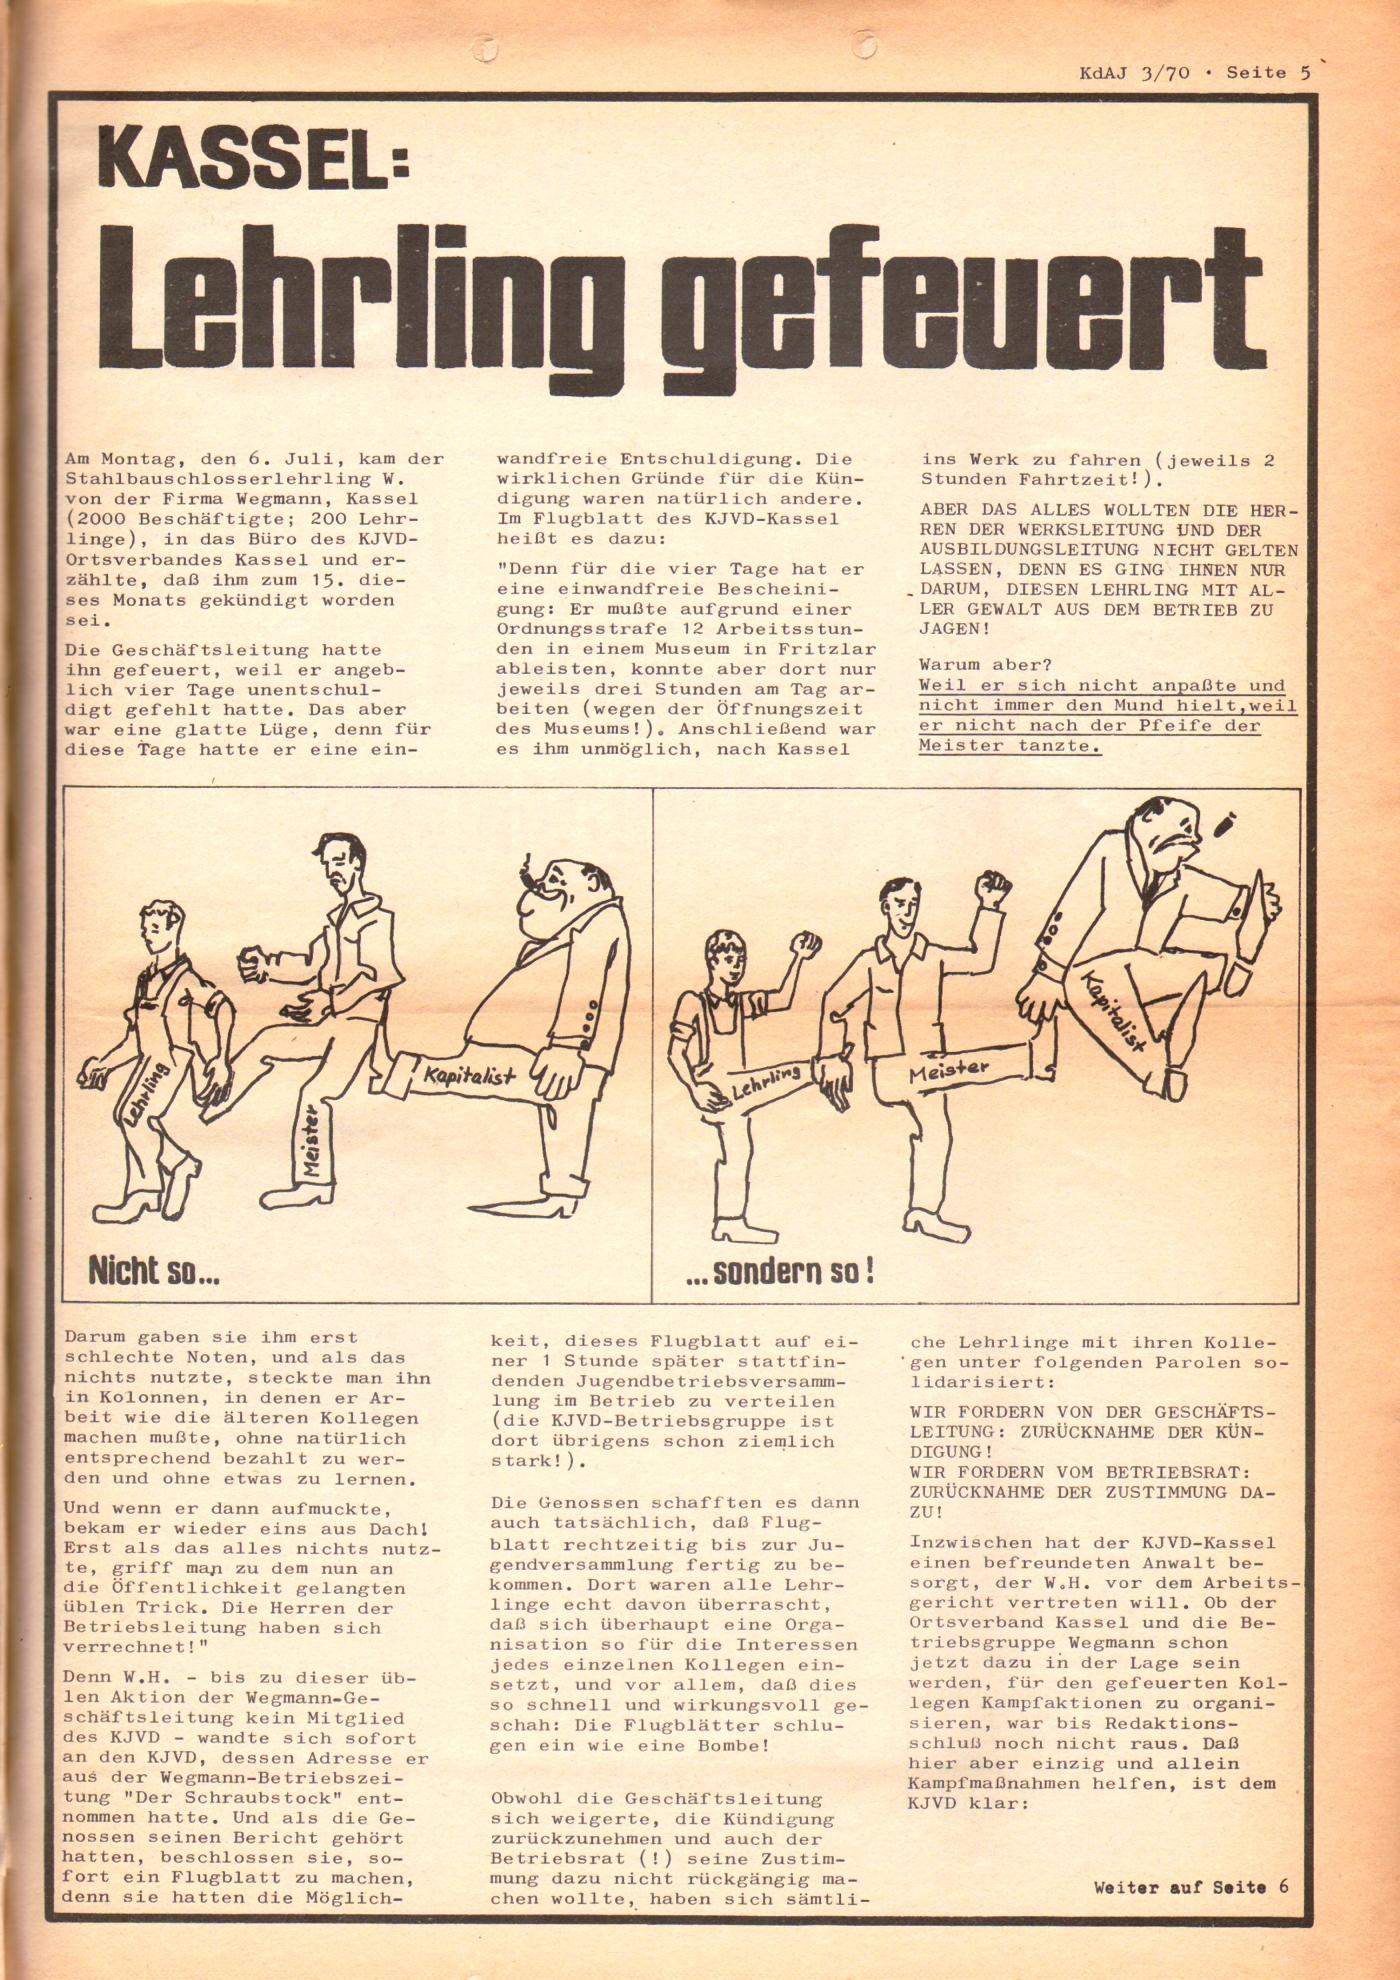 KDAJ, 1. Jg., August 1970, Nr. 3, Seite 5